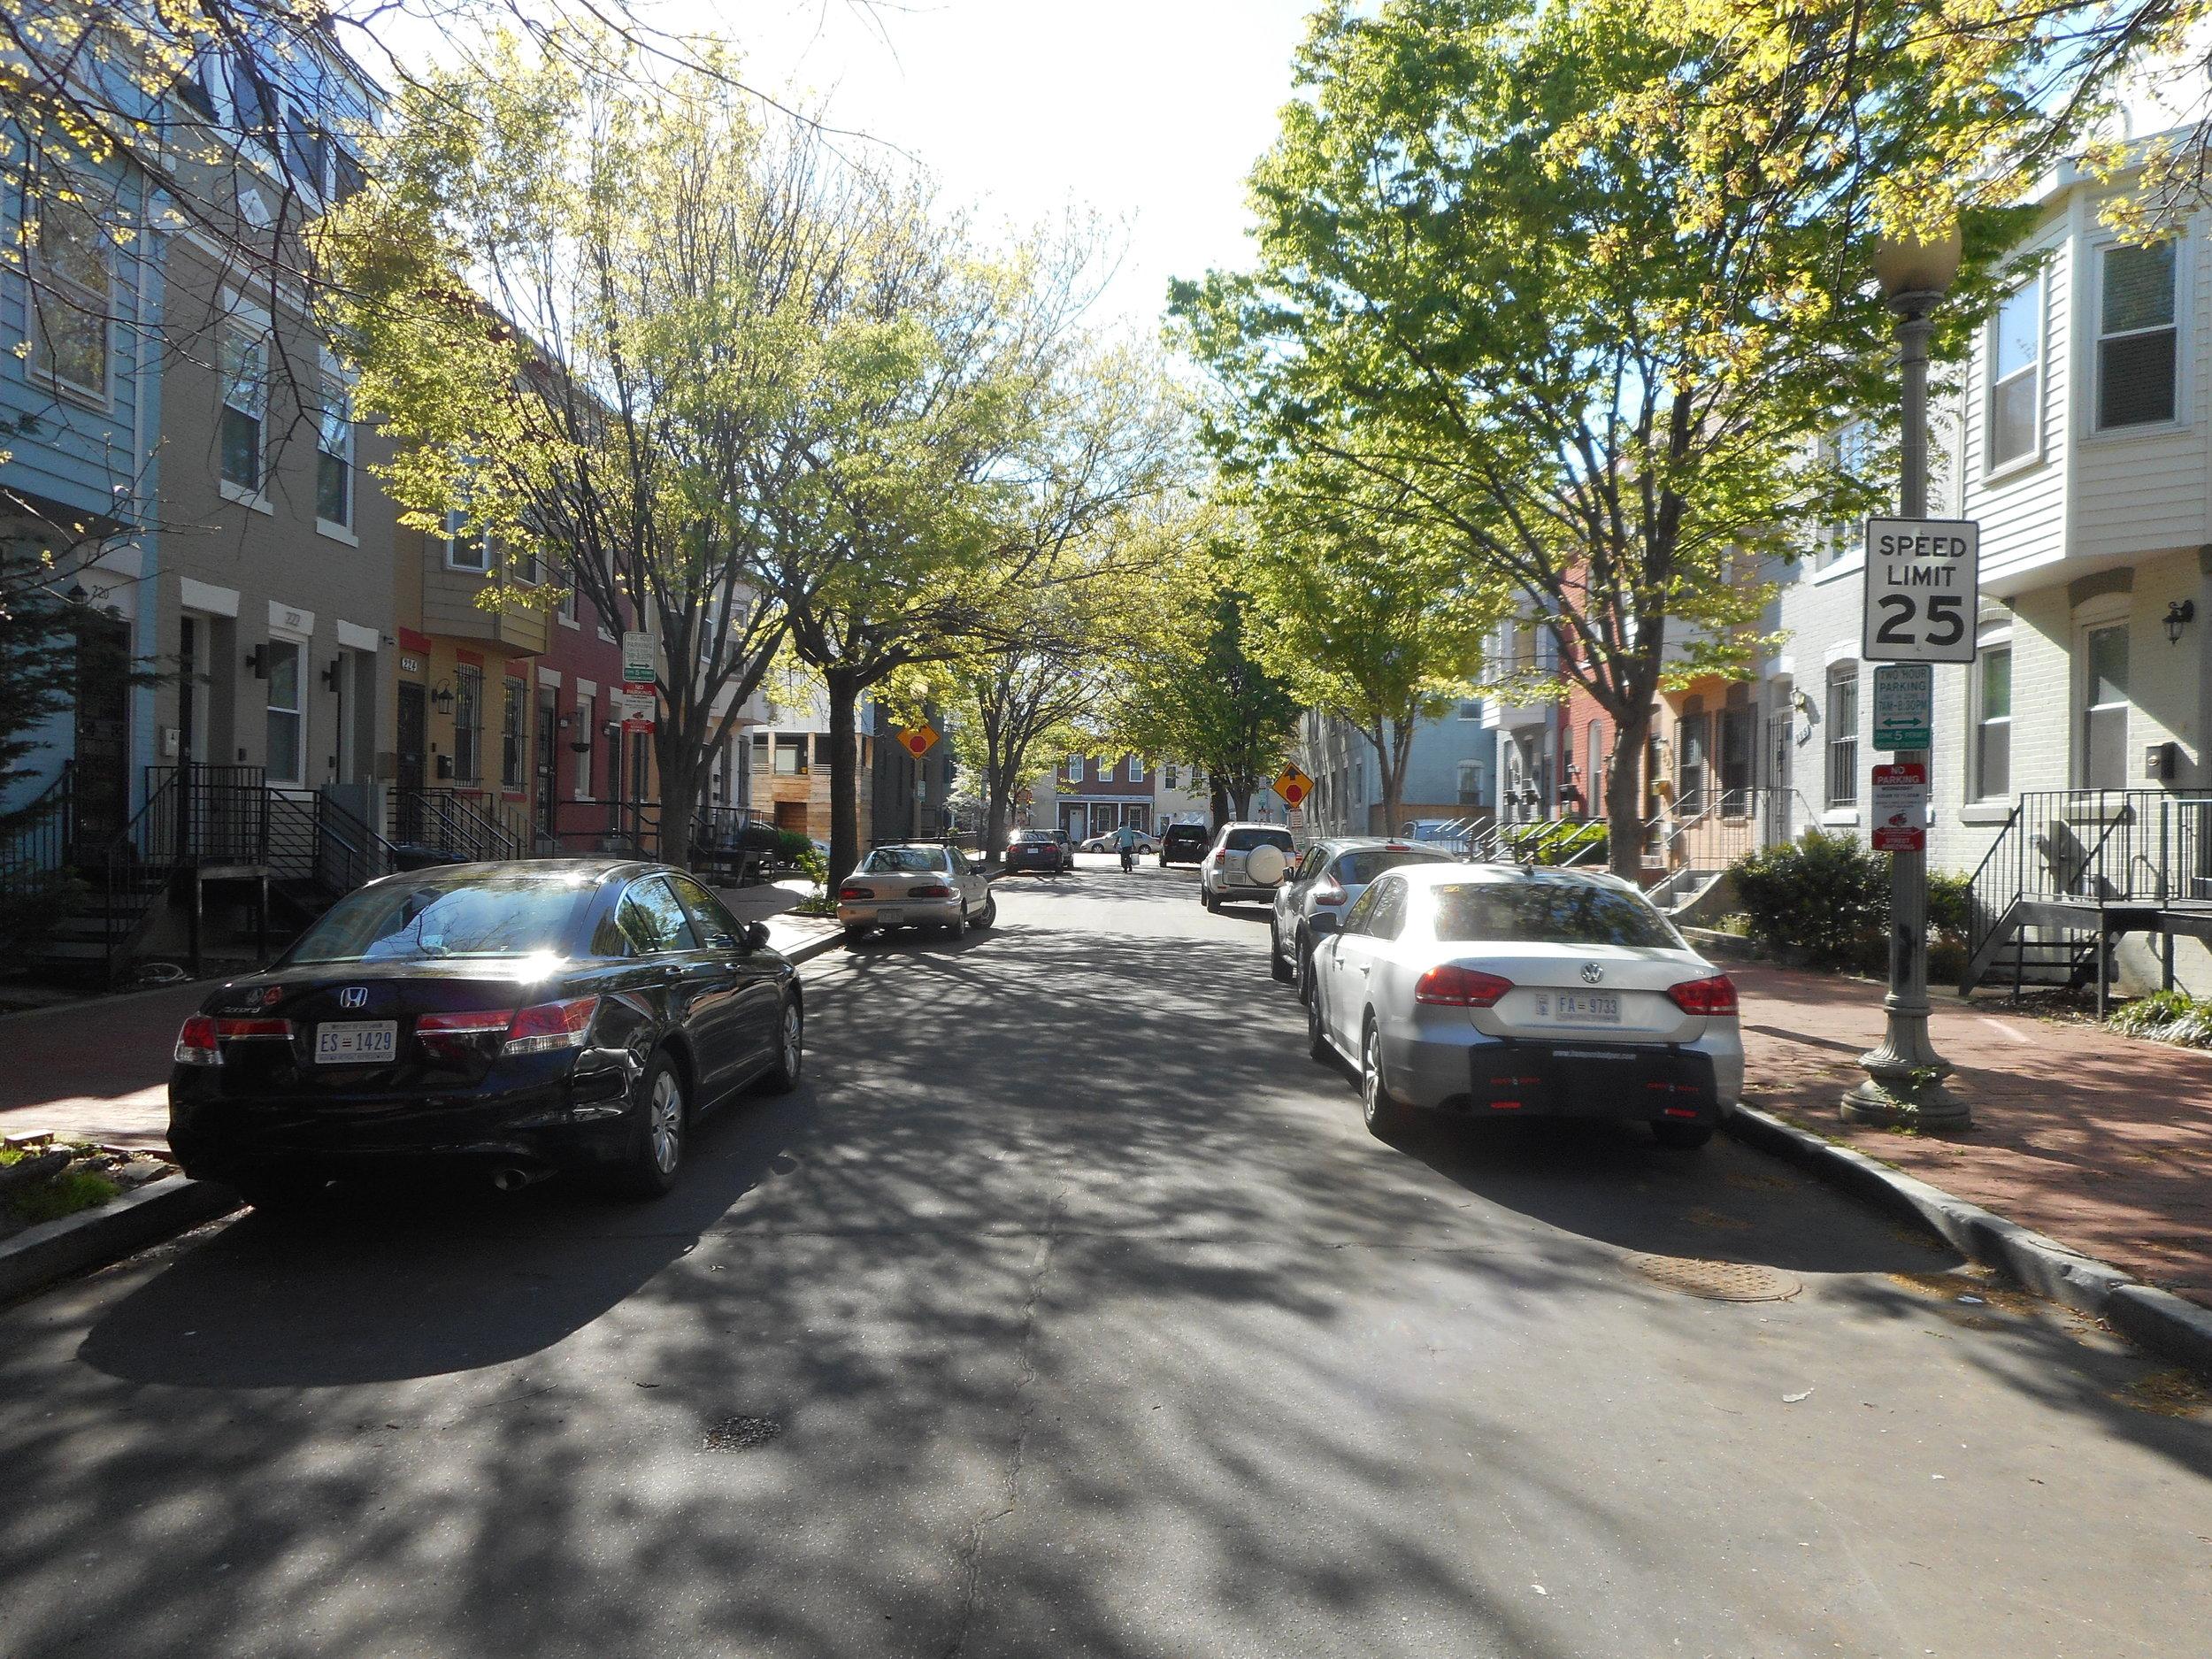 Bates Street